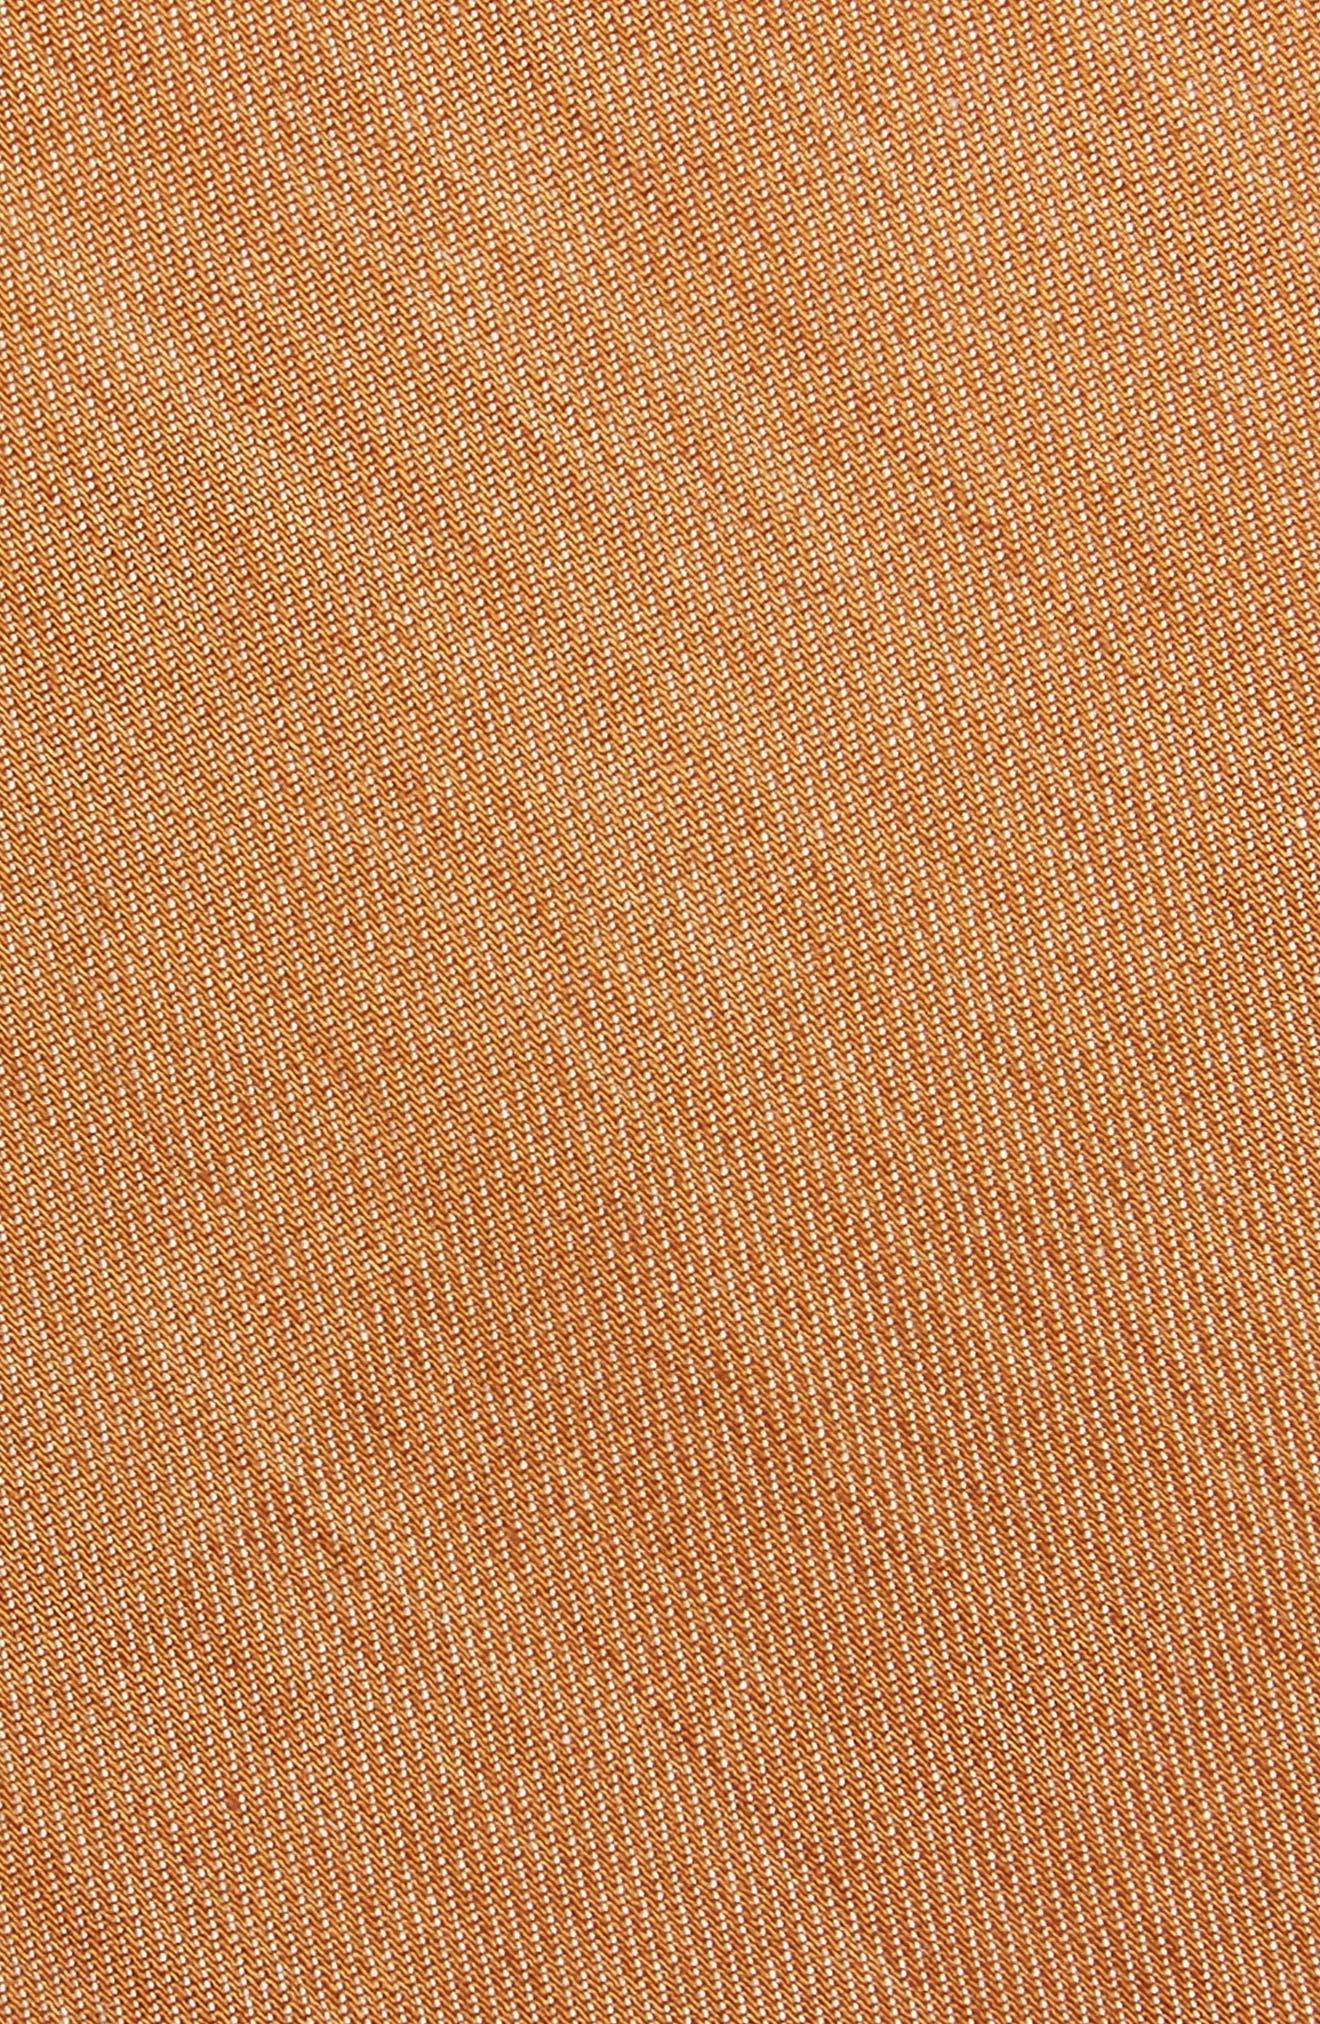 Abbey Solid Cotton Tie,                             Alternate thumbnail 2, color,                             220